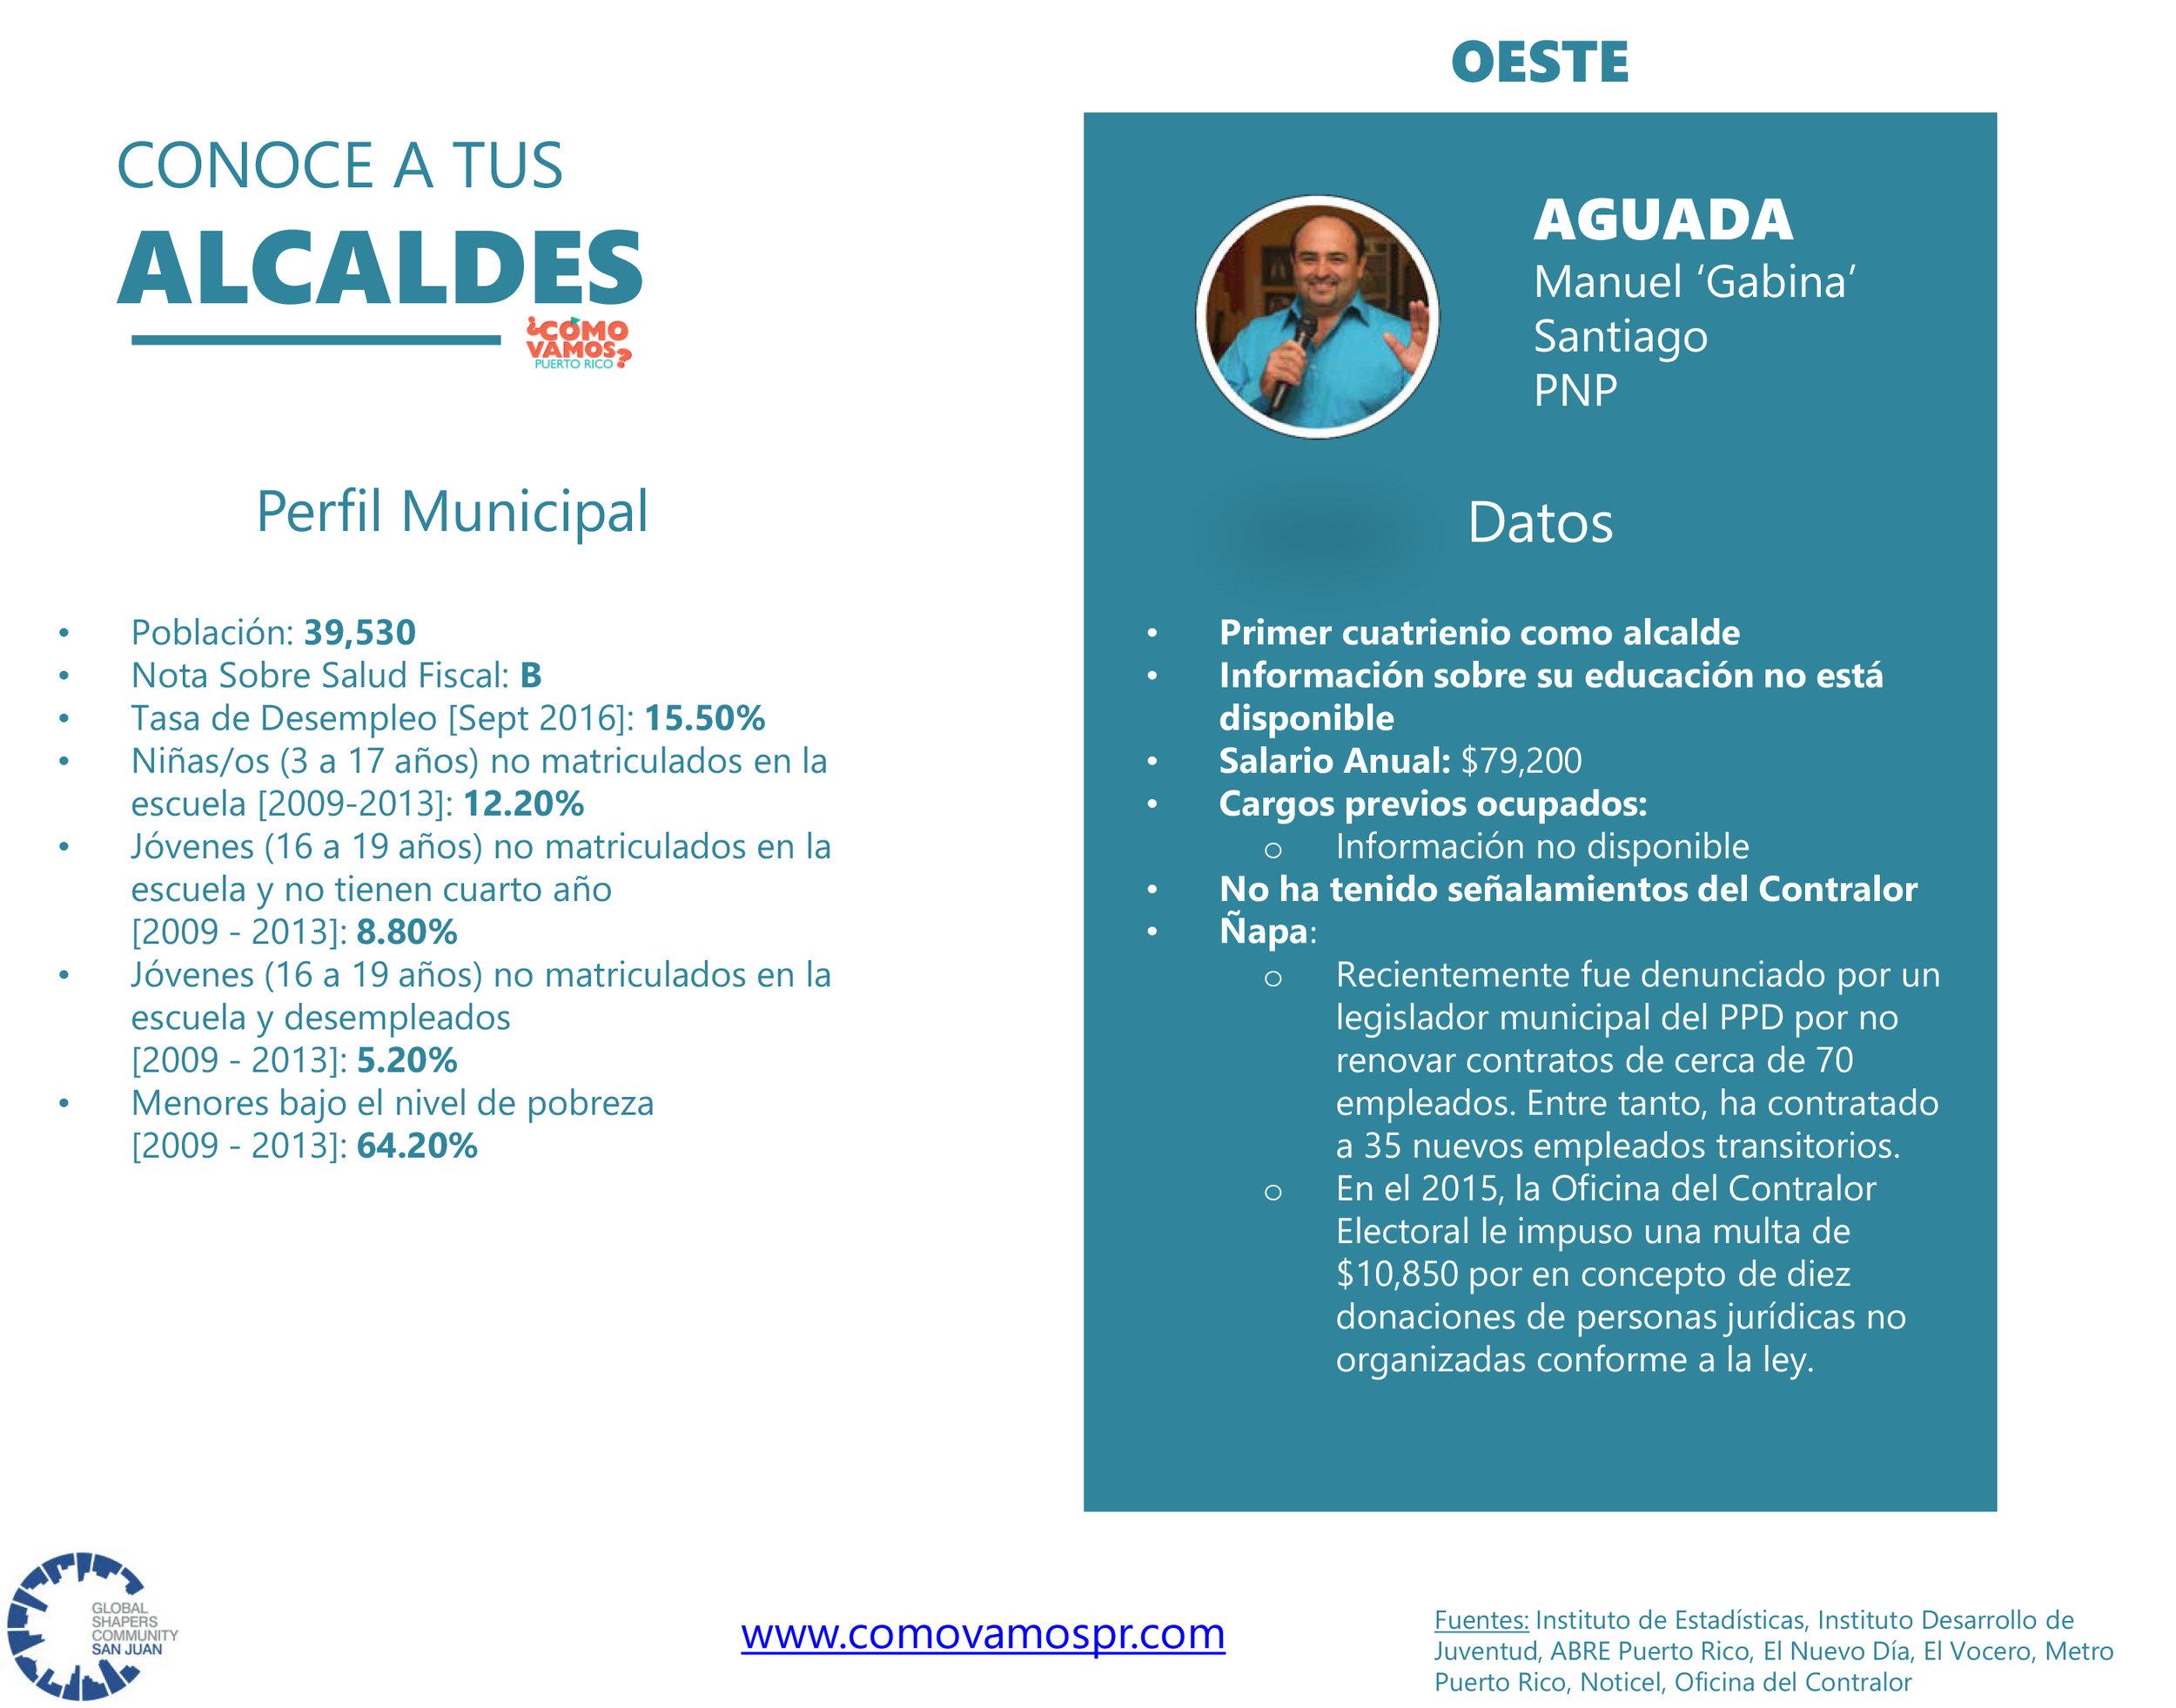 Alcaldes_Oeste_Aguada.jpg